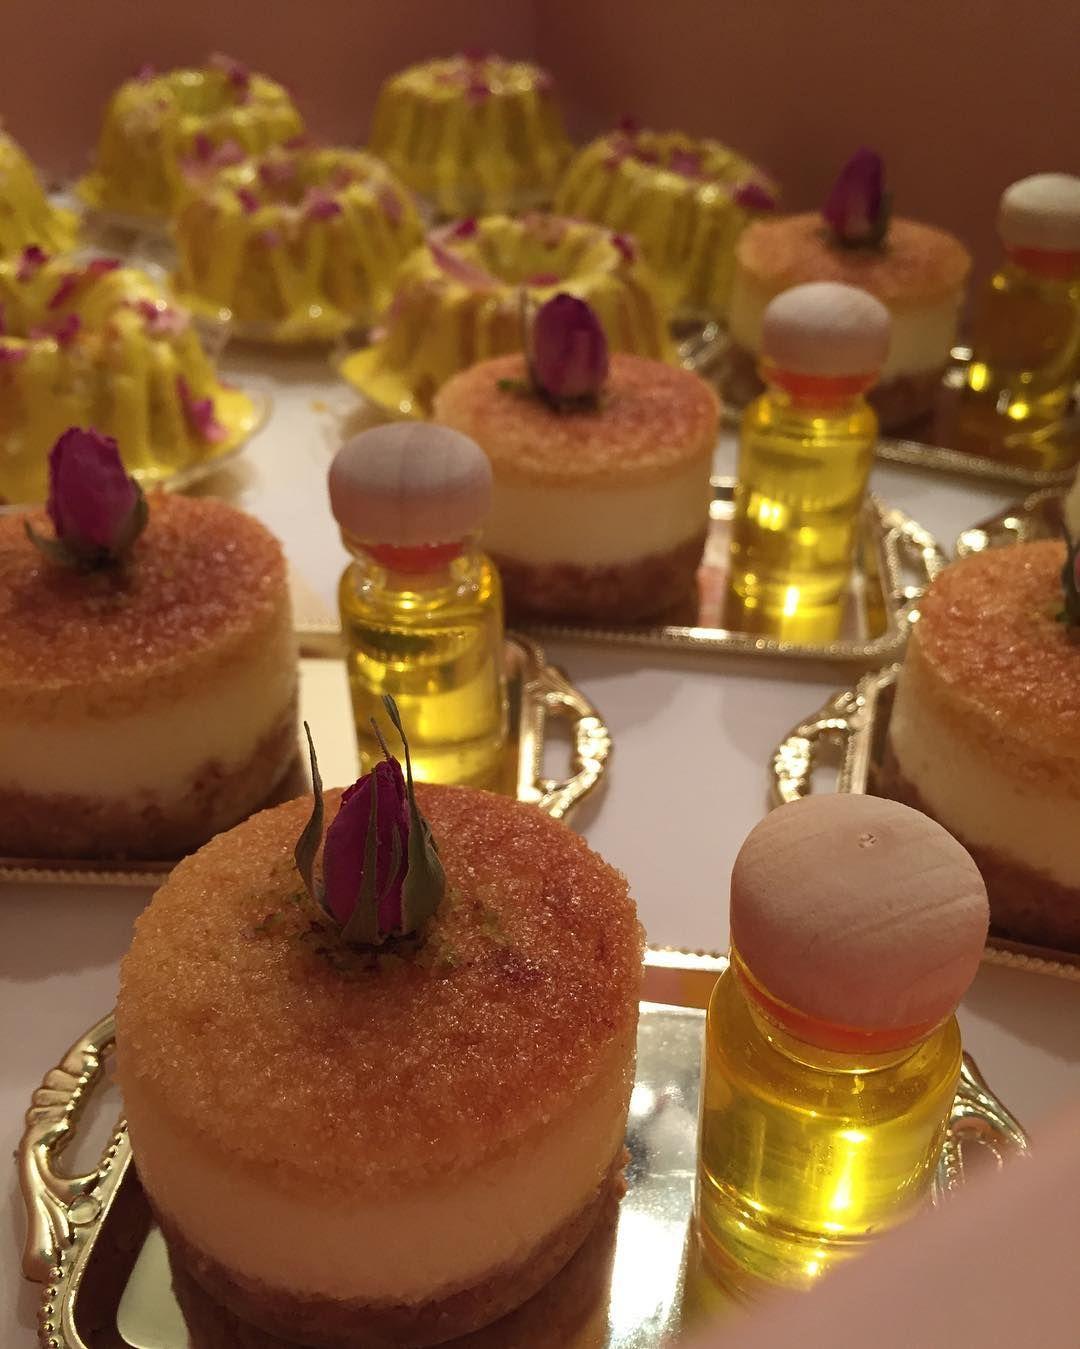 Princess Sweets On Instagram تشيز بسبوسه مع الشيره حلويات حلا قهوه مناسبات مكس مميز ميني تشيز ب Food Carving Buffet Food Sweets Recipes